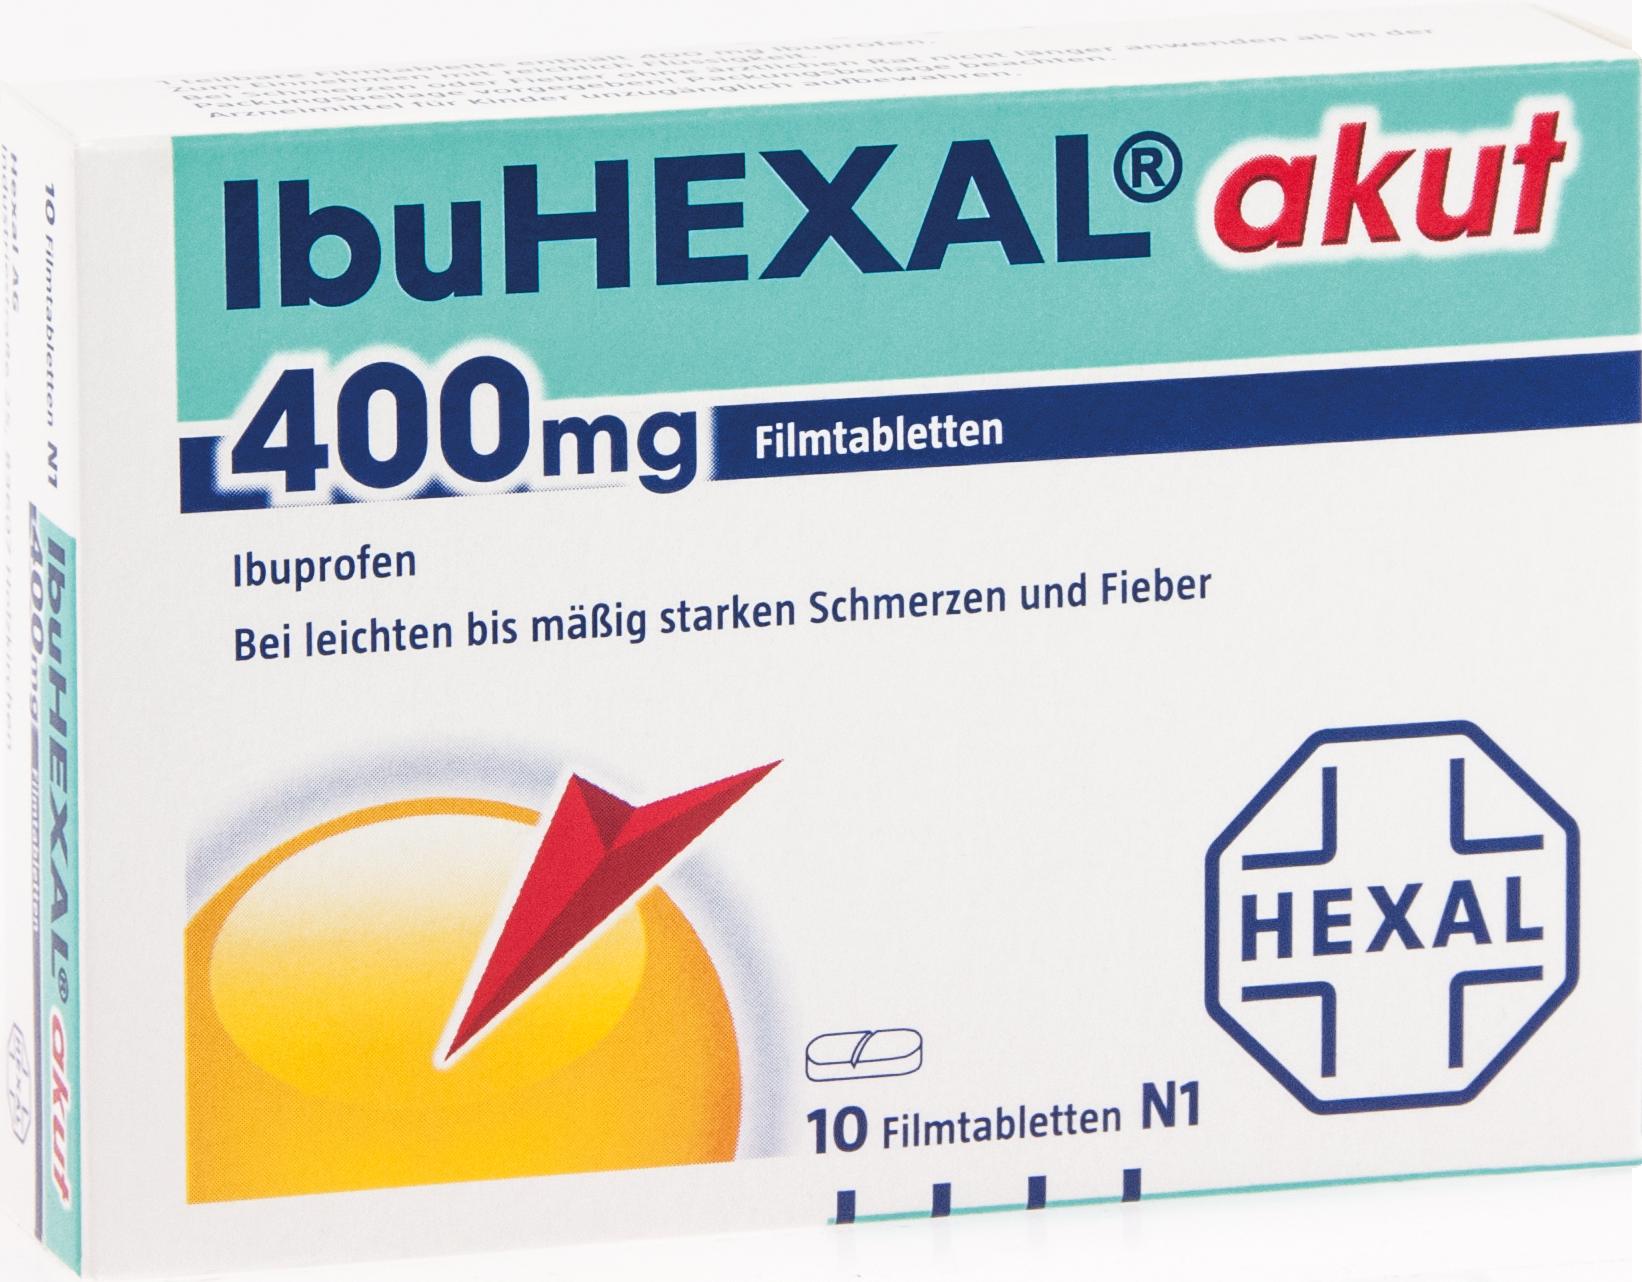 Ibuhexal akut 400